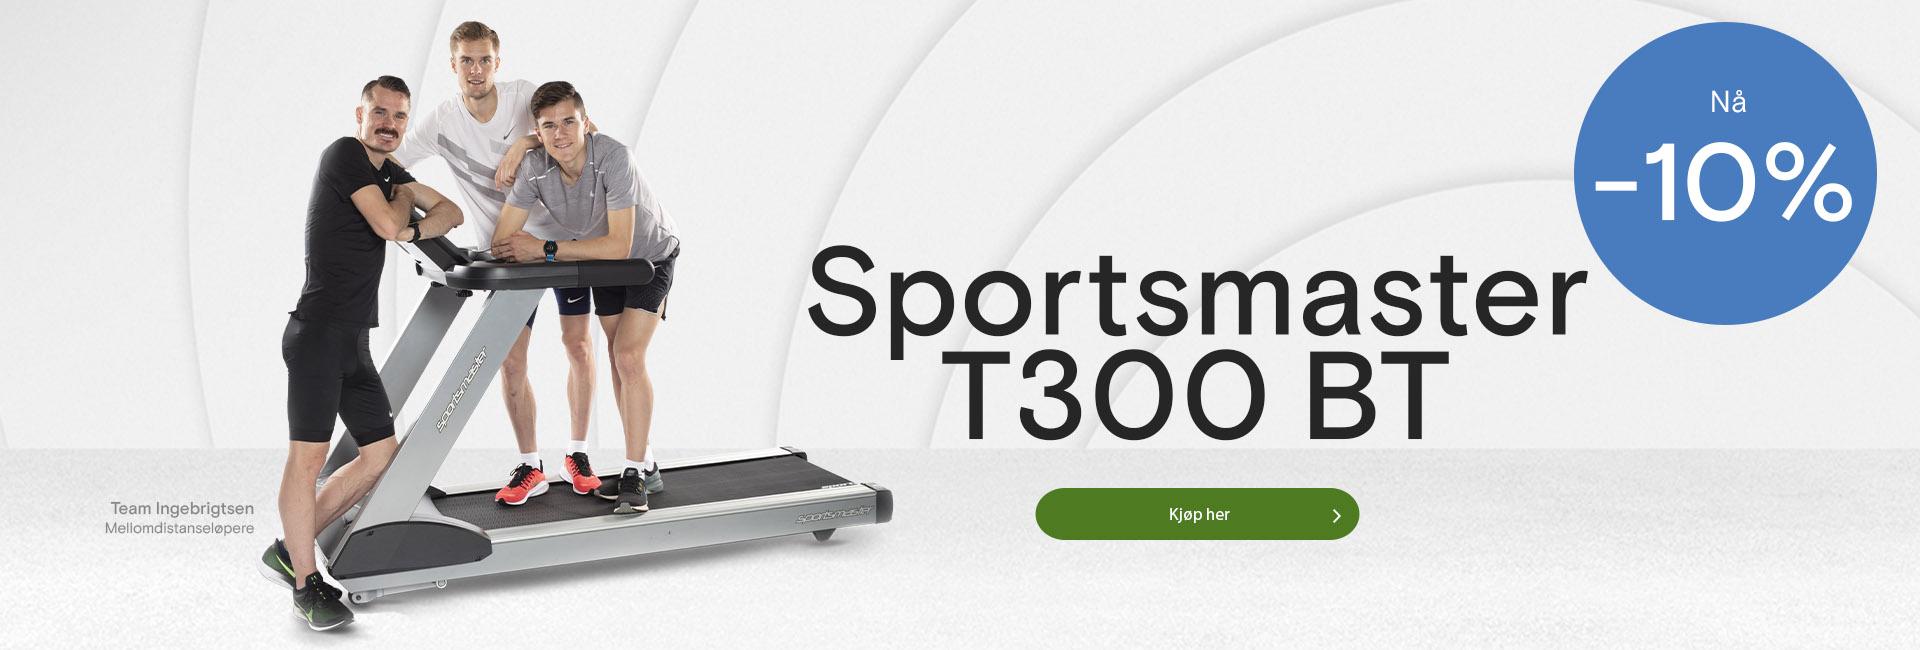 Tilbud på Sportsmaster T300 BT